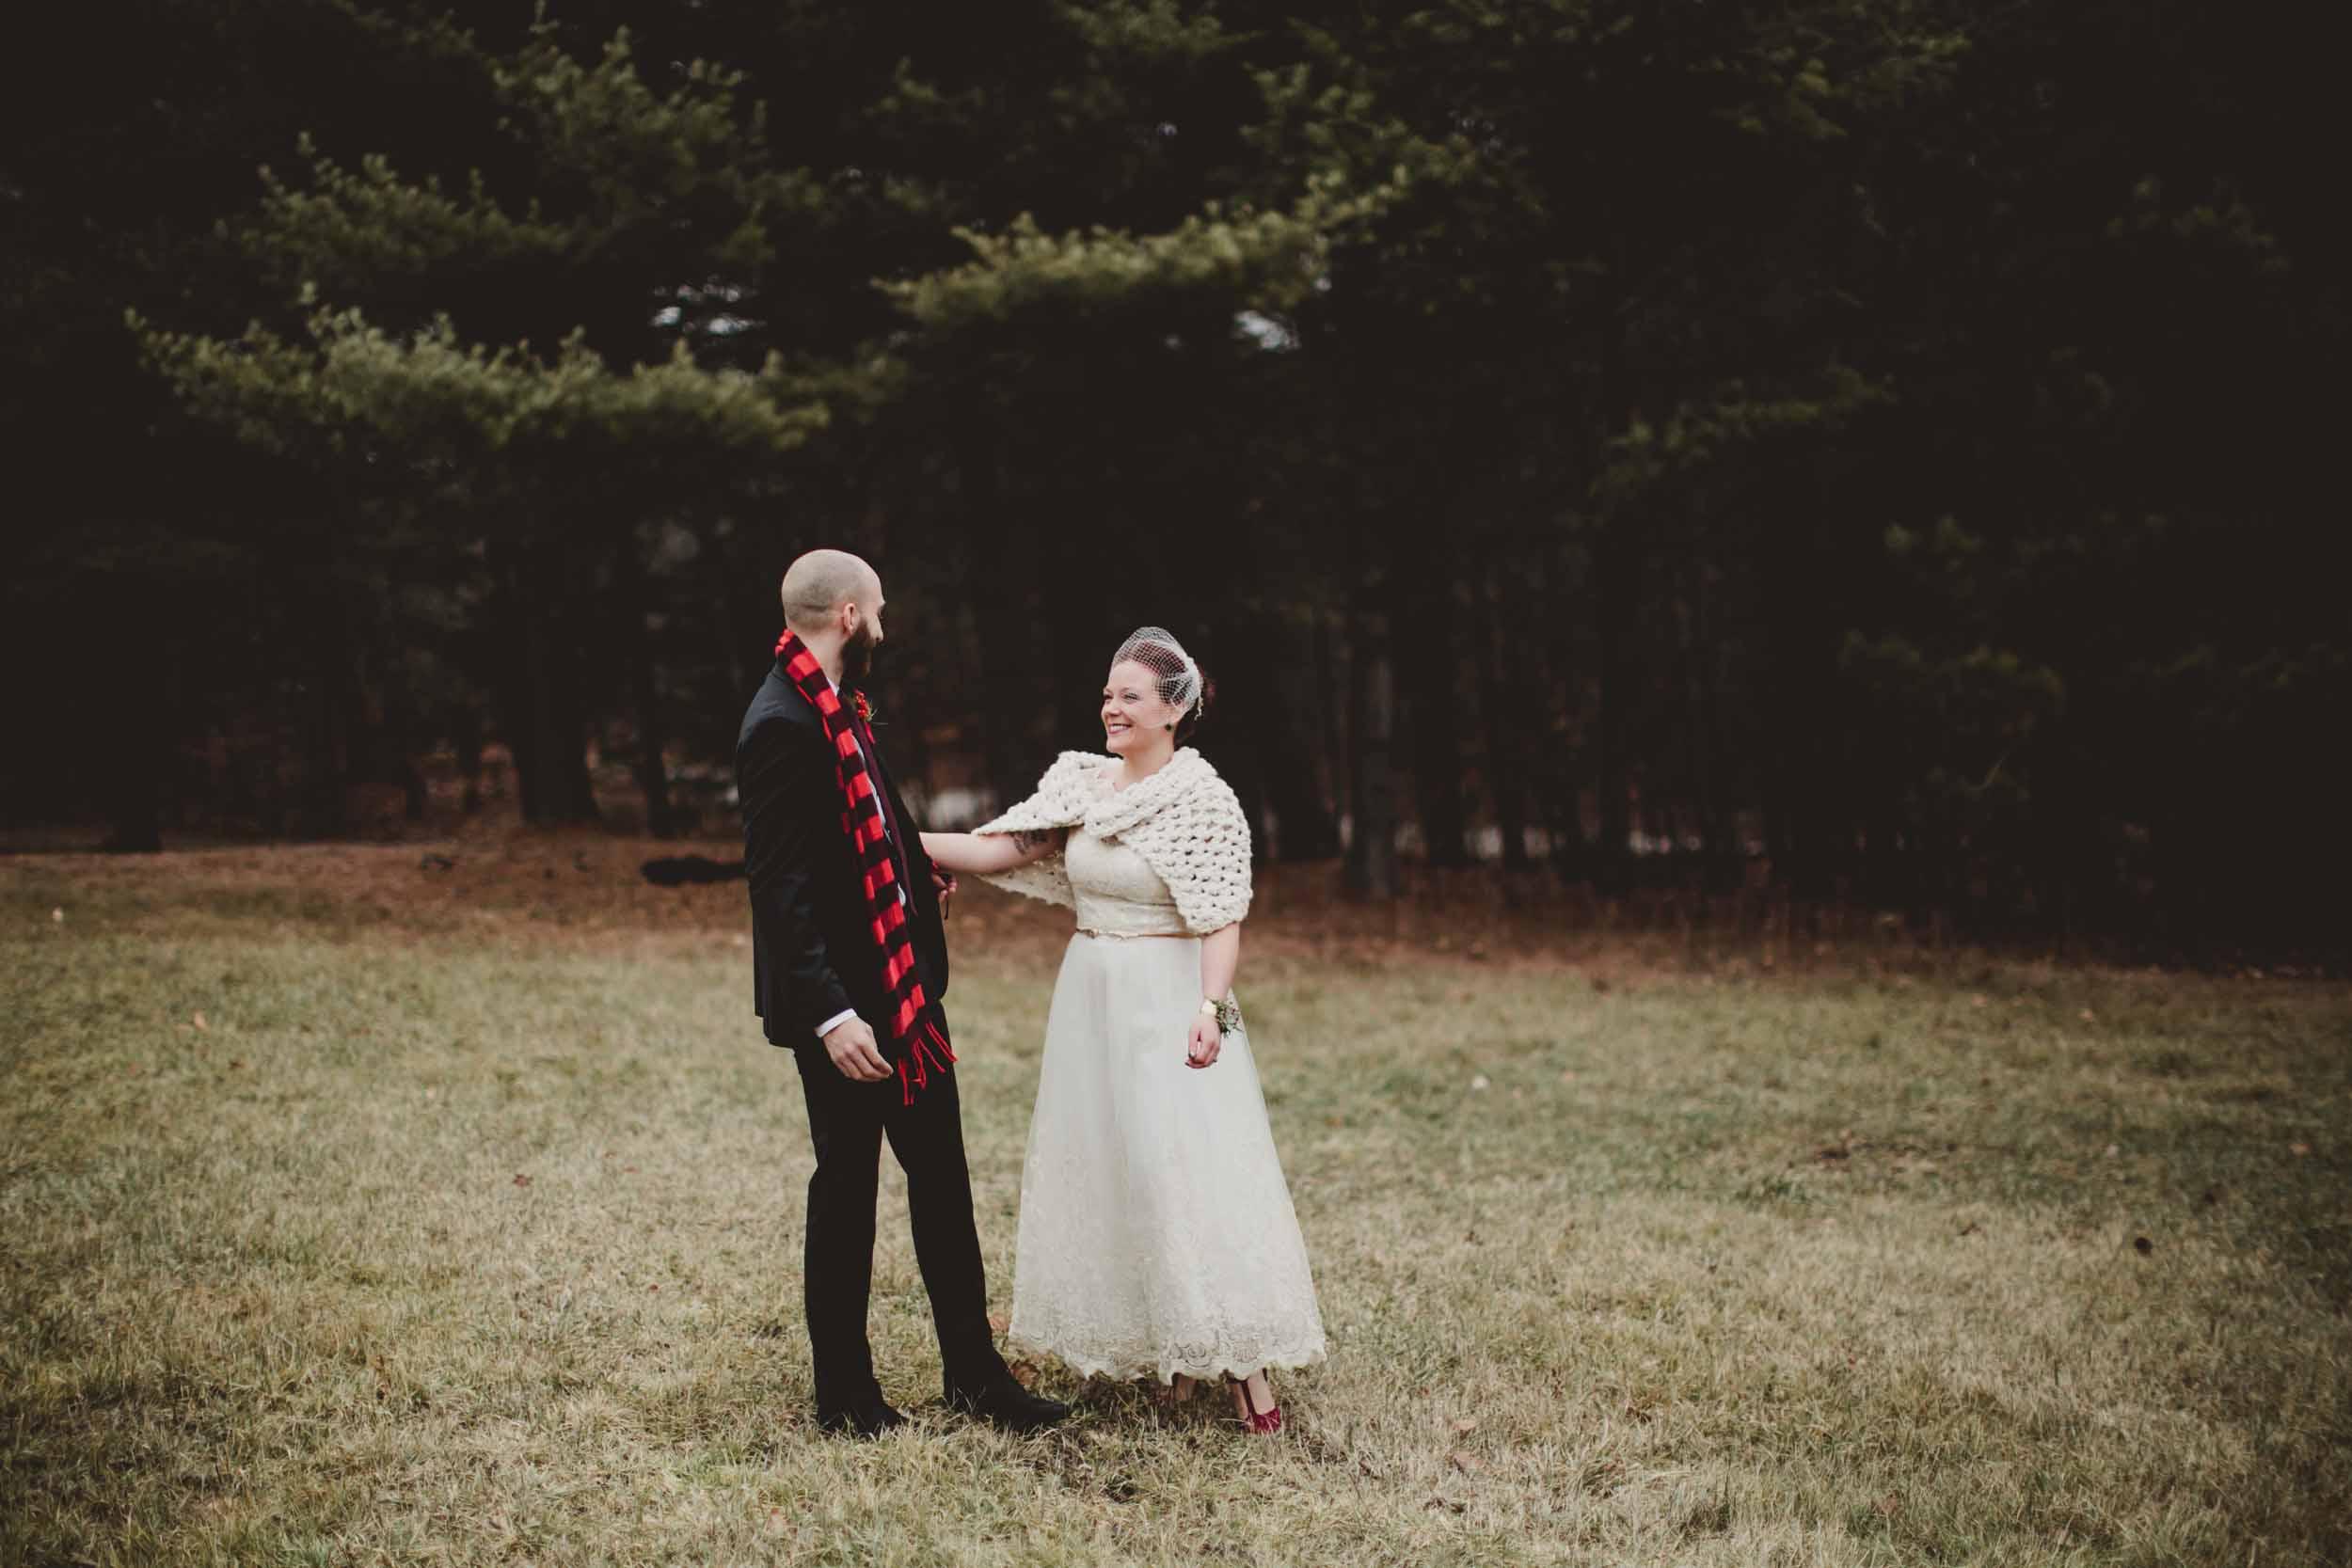 Stone-mountain-arts-wedding92.jpg